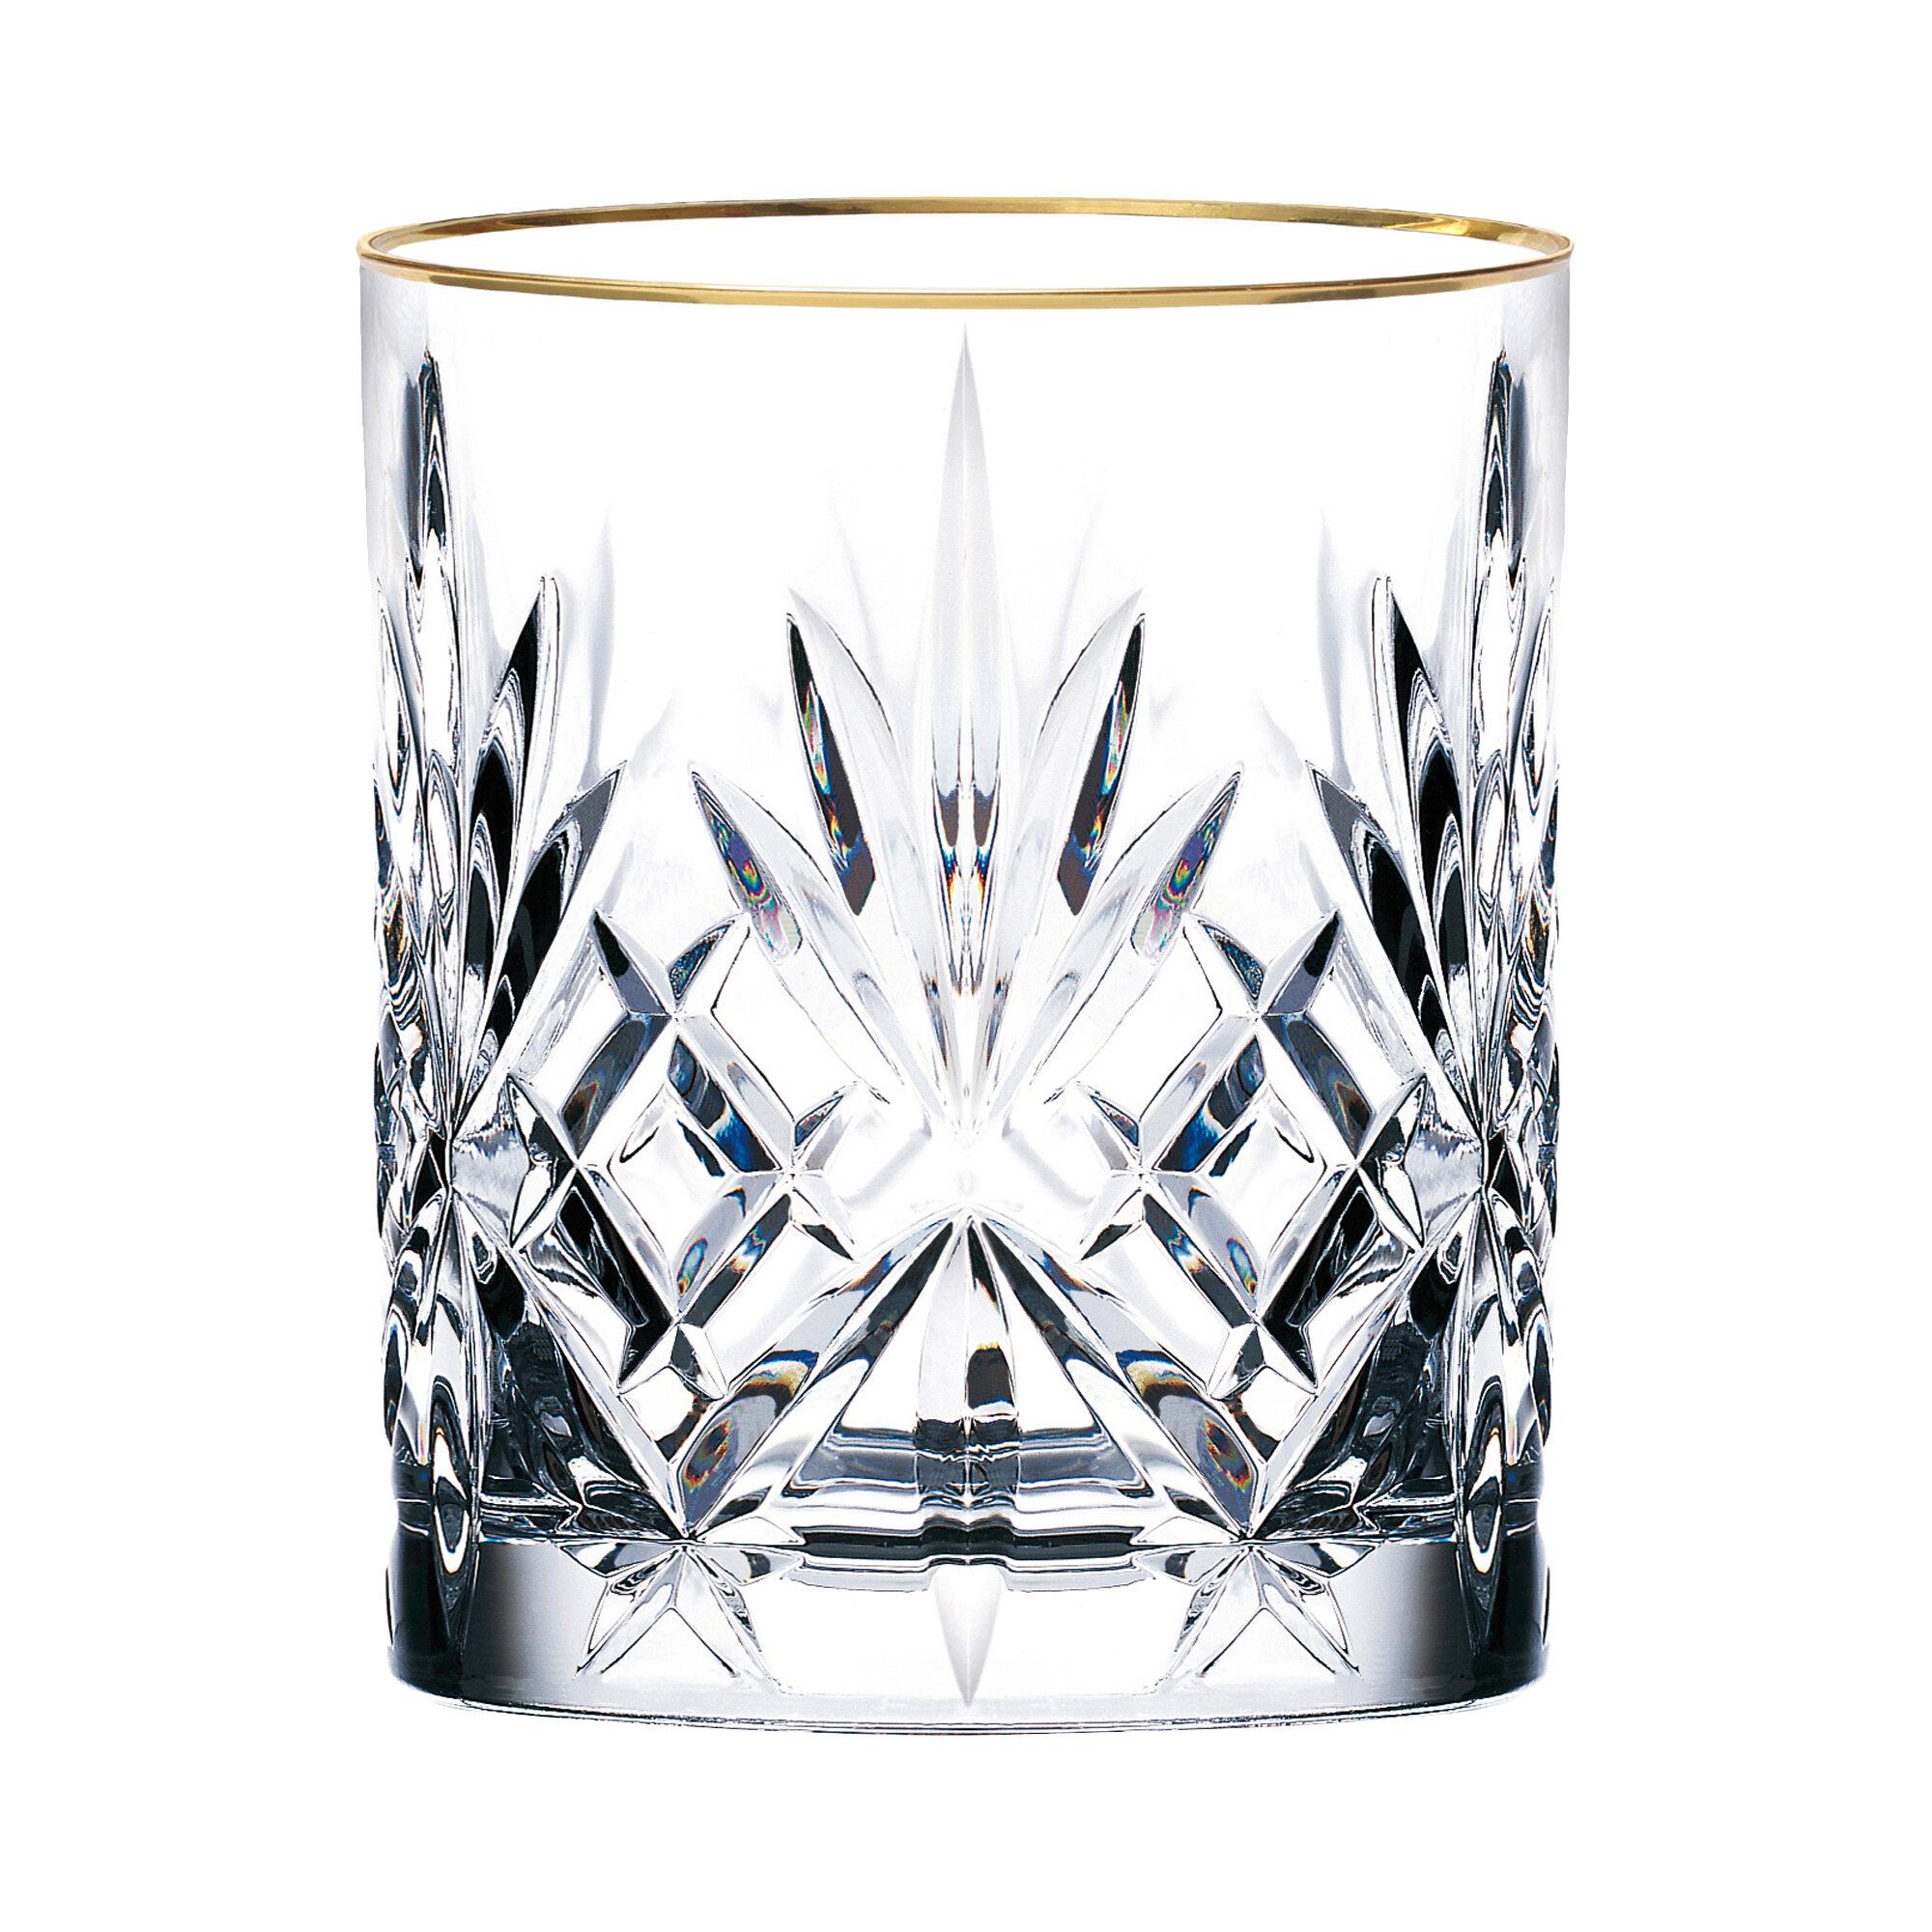 Geometric Whiskey Glasses Drinkware You Ll Love In 2021 Wayfair